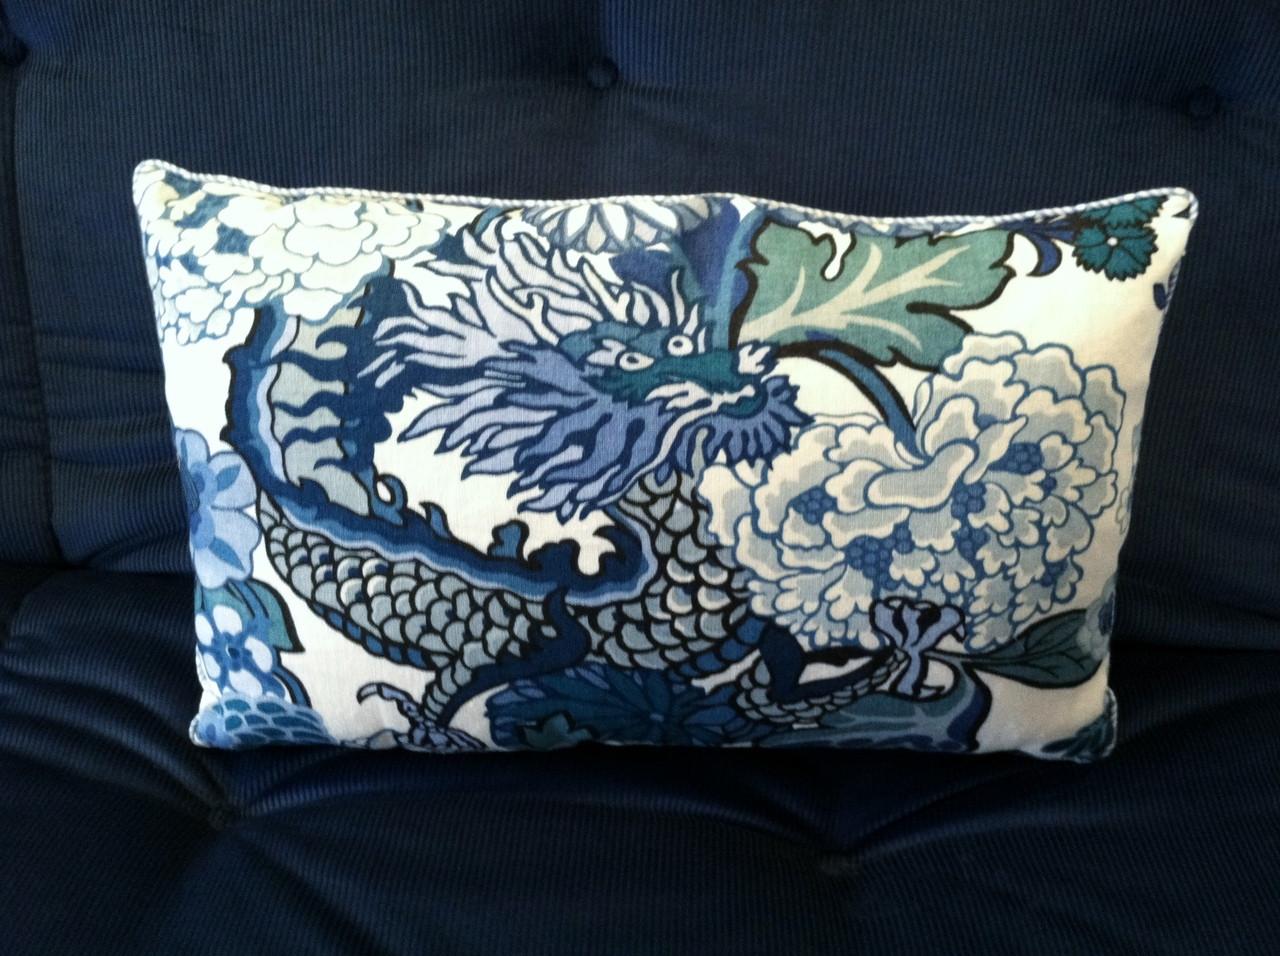 chiang mai dragon throw pillow fabric by schumacher